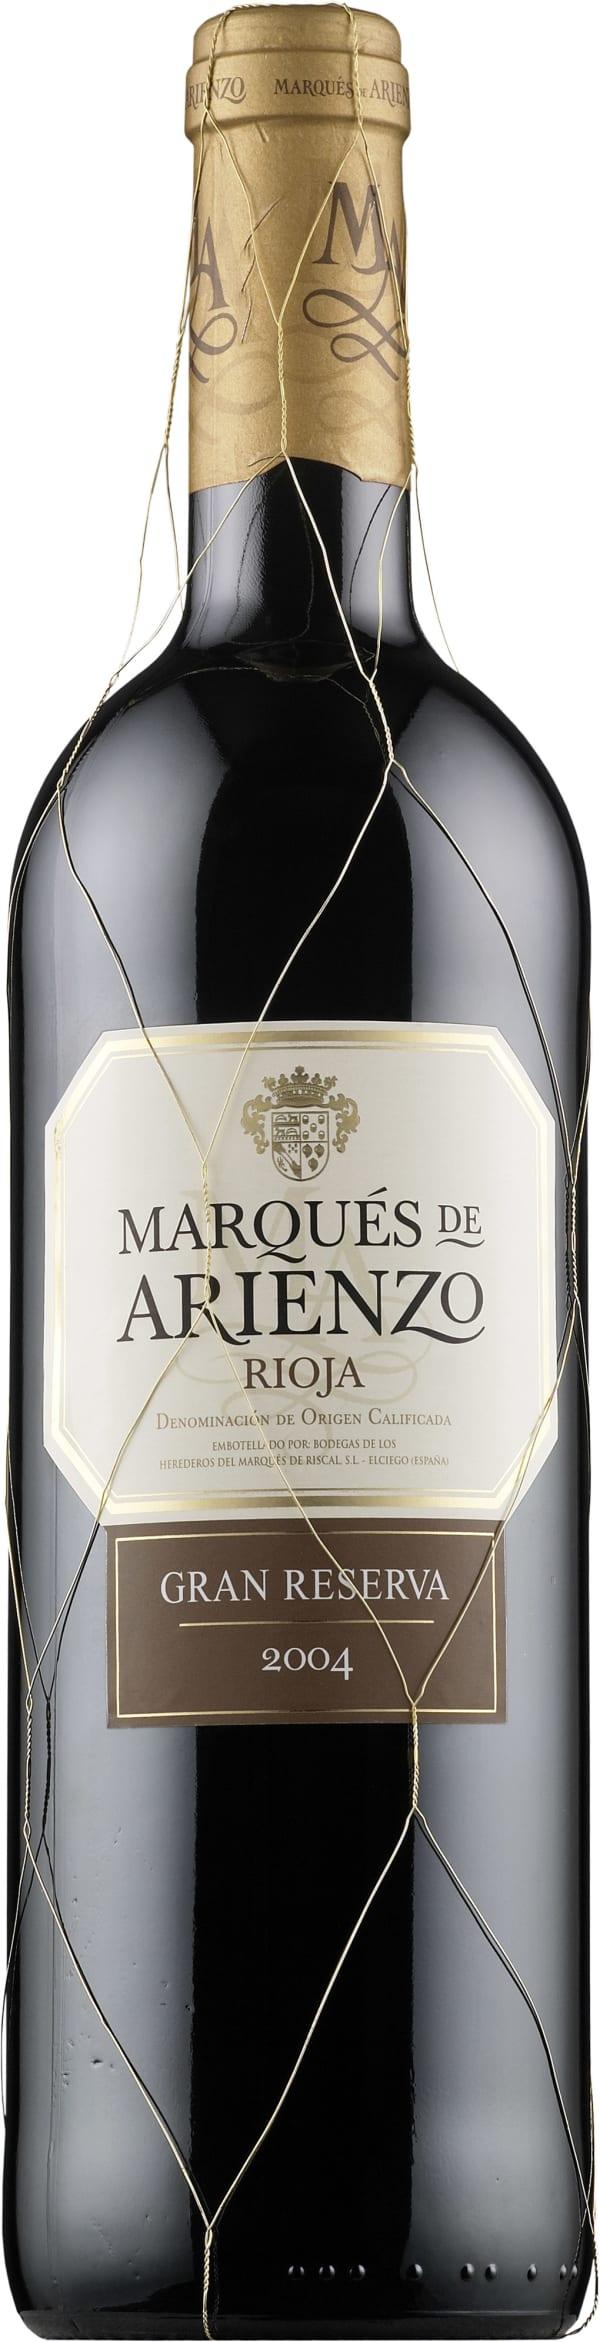 Marques de Arienzo Gran Reserva 2009